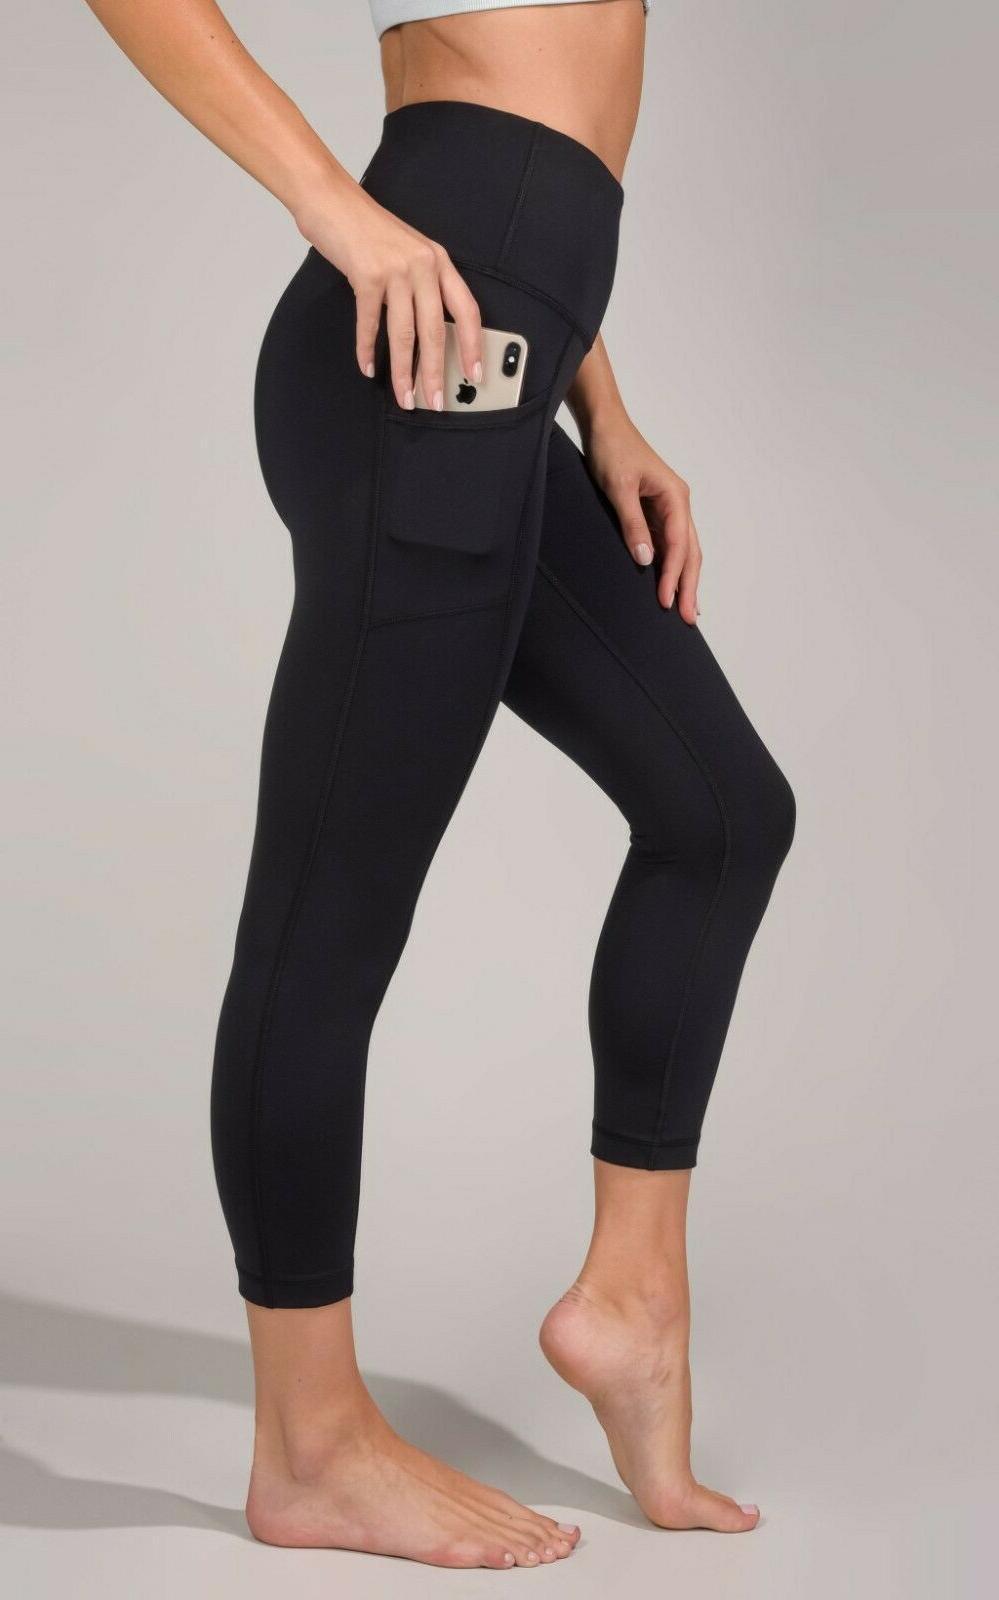 NEW 90 Reflex Interlink High Pocket Yoga Pants